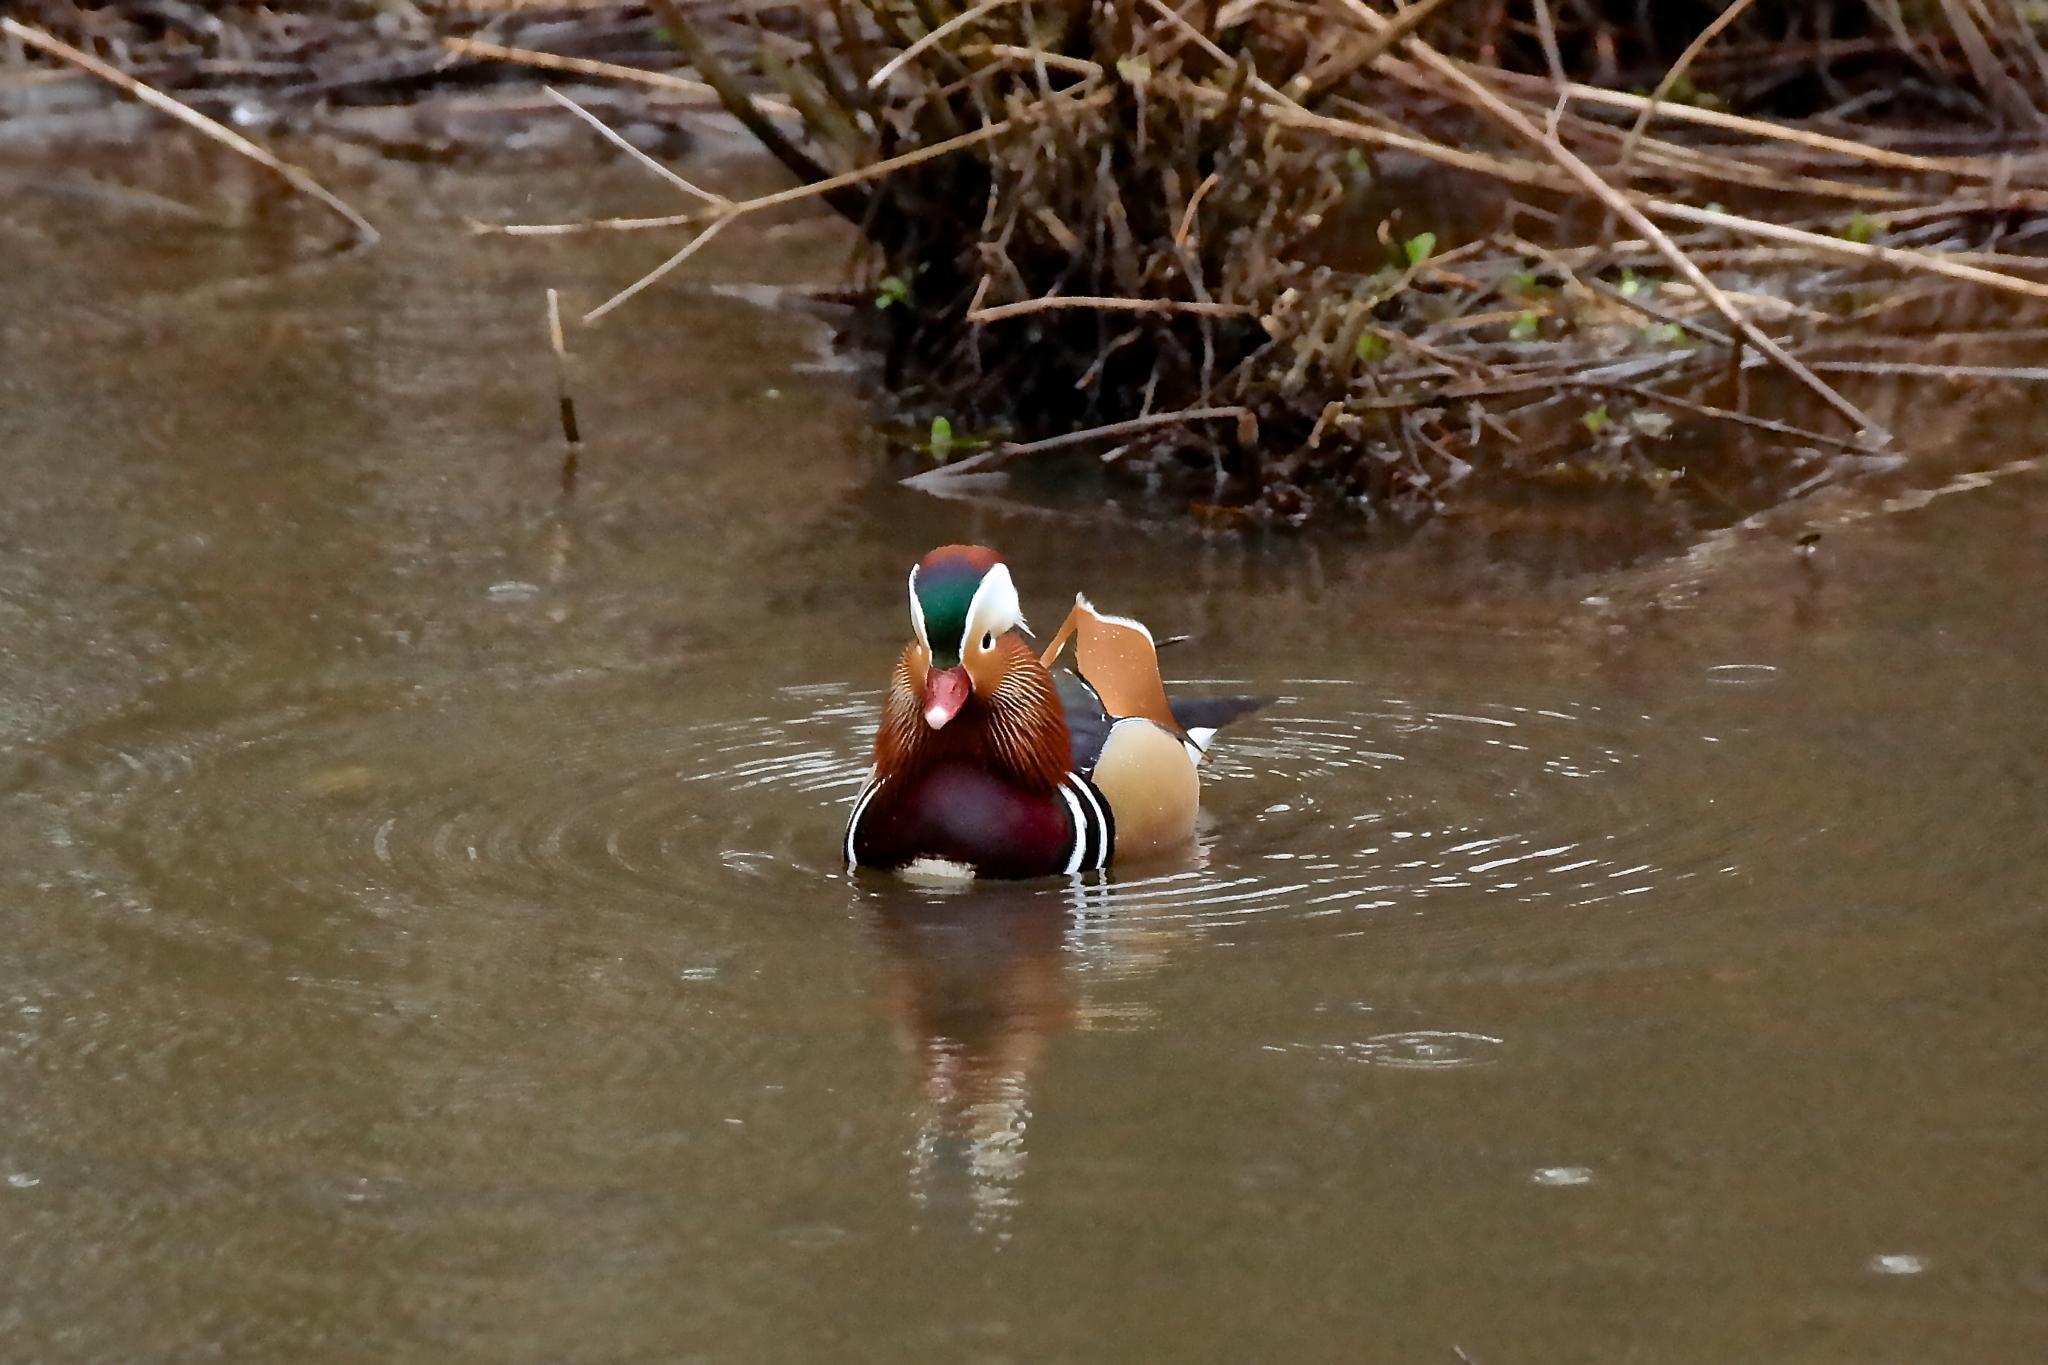 mandarin duck by leigh.hudson.779